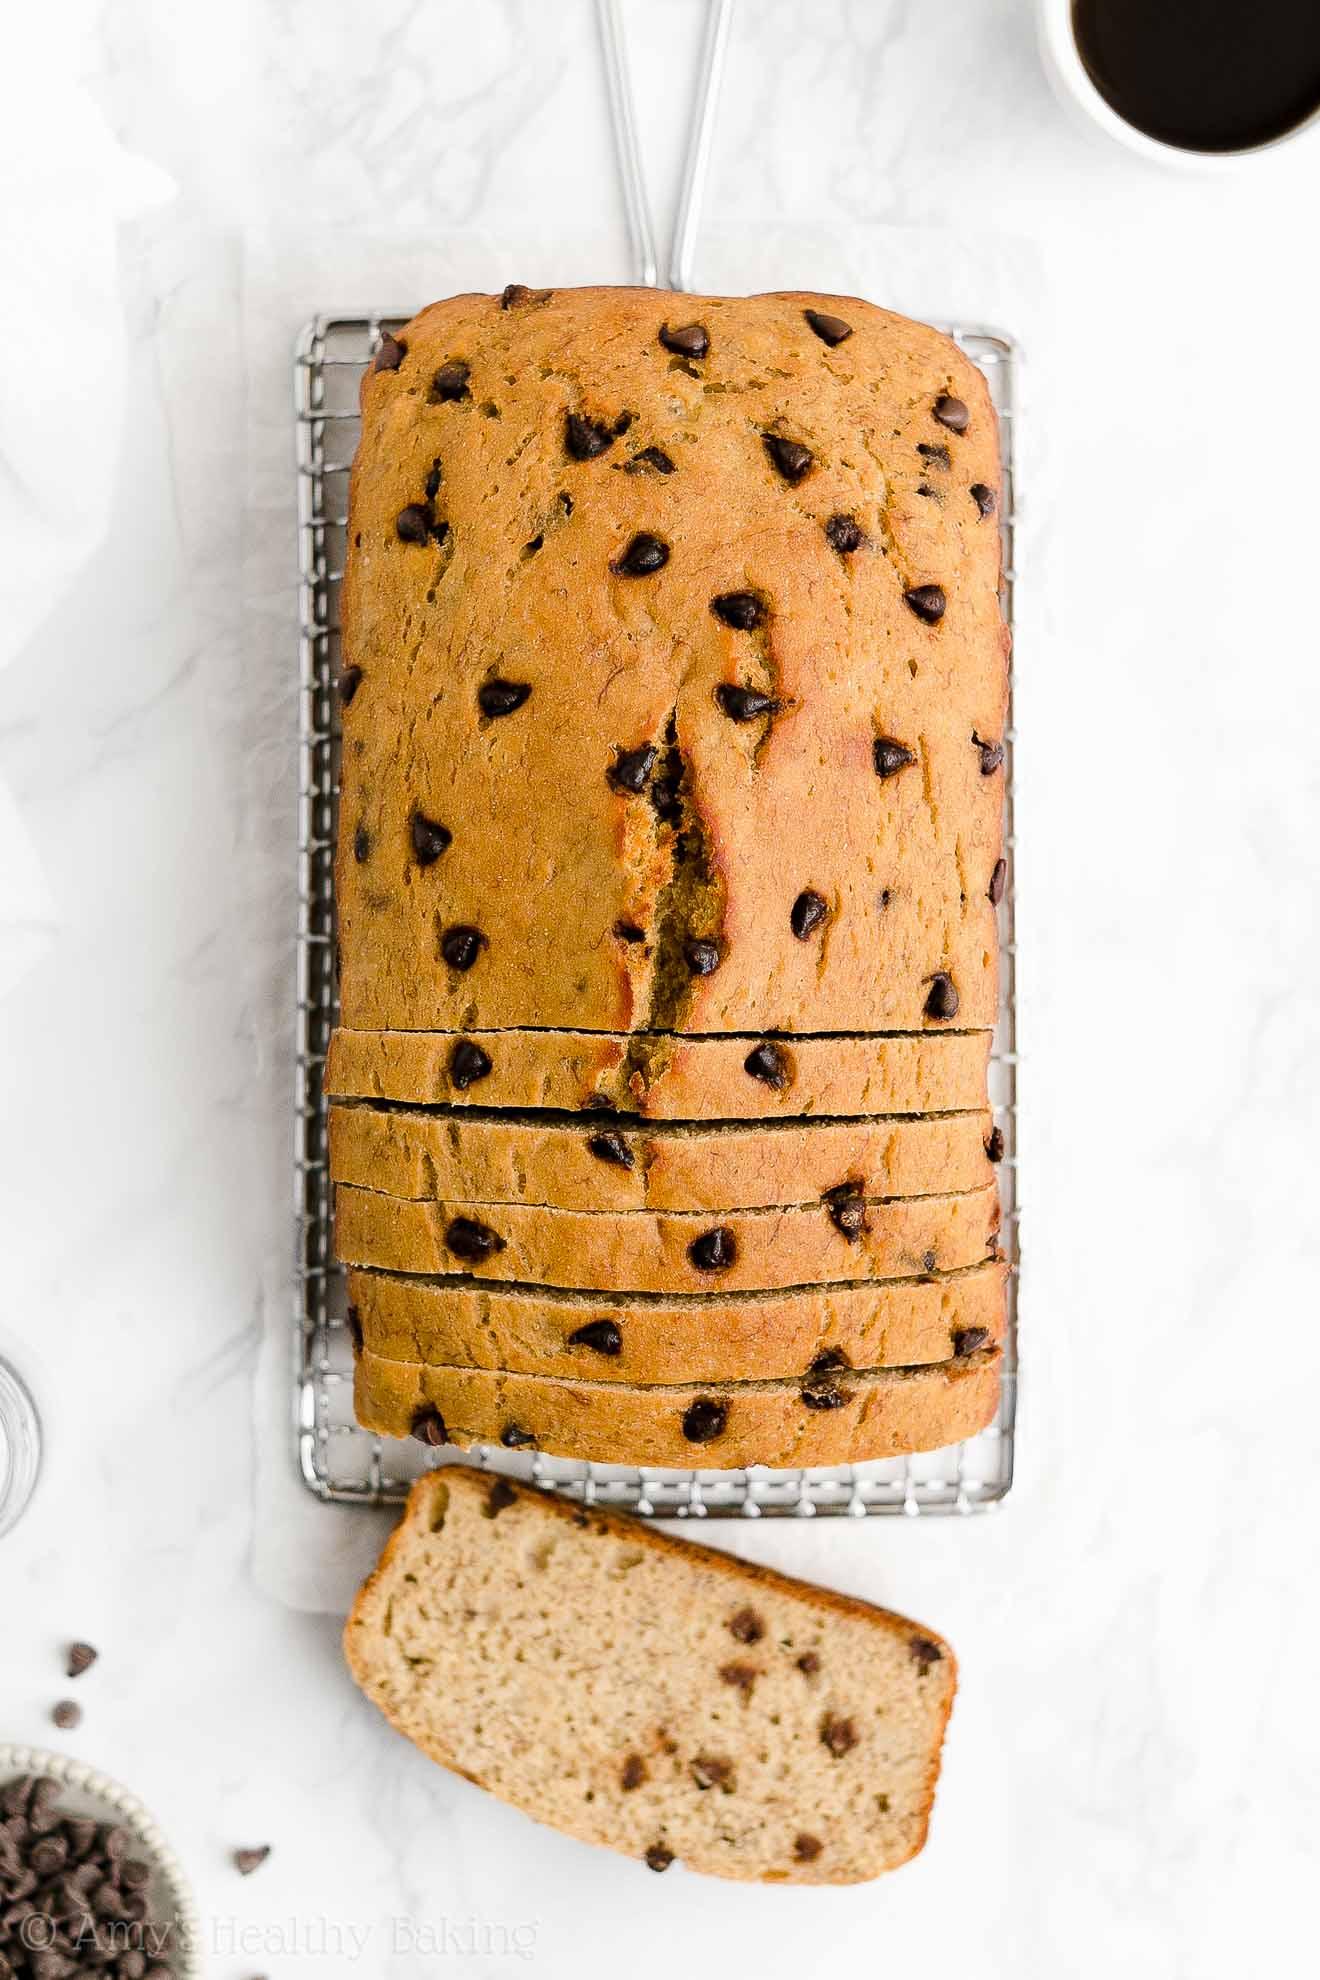 Best Easy Healthy Clean Eating No Sugar Moist Chocolate Chip Banana Bread